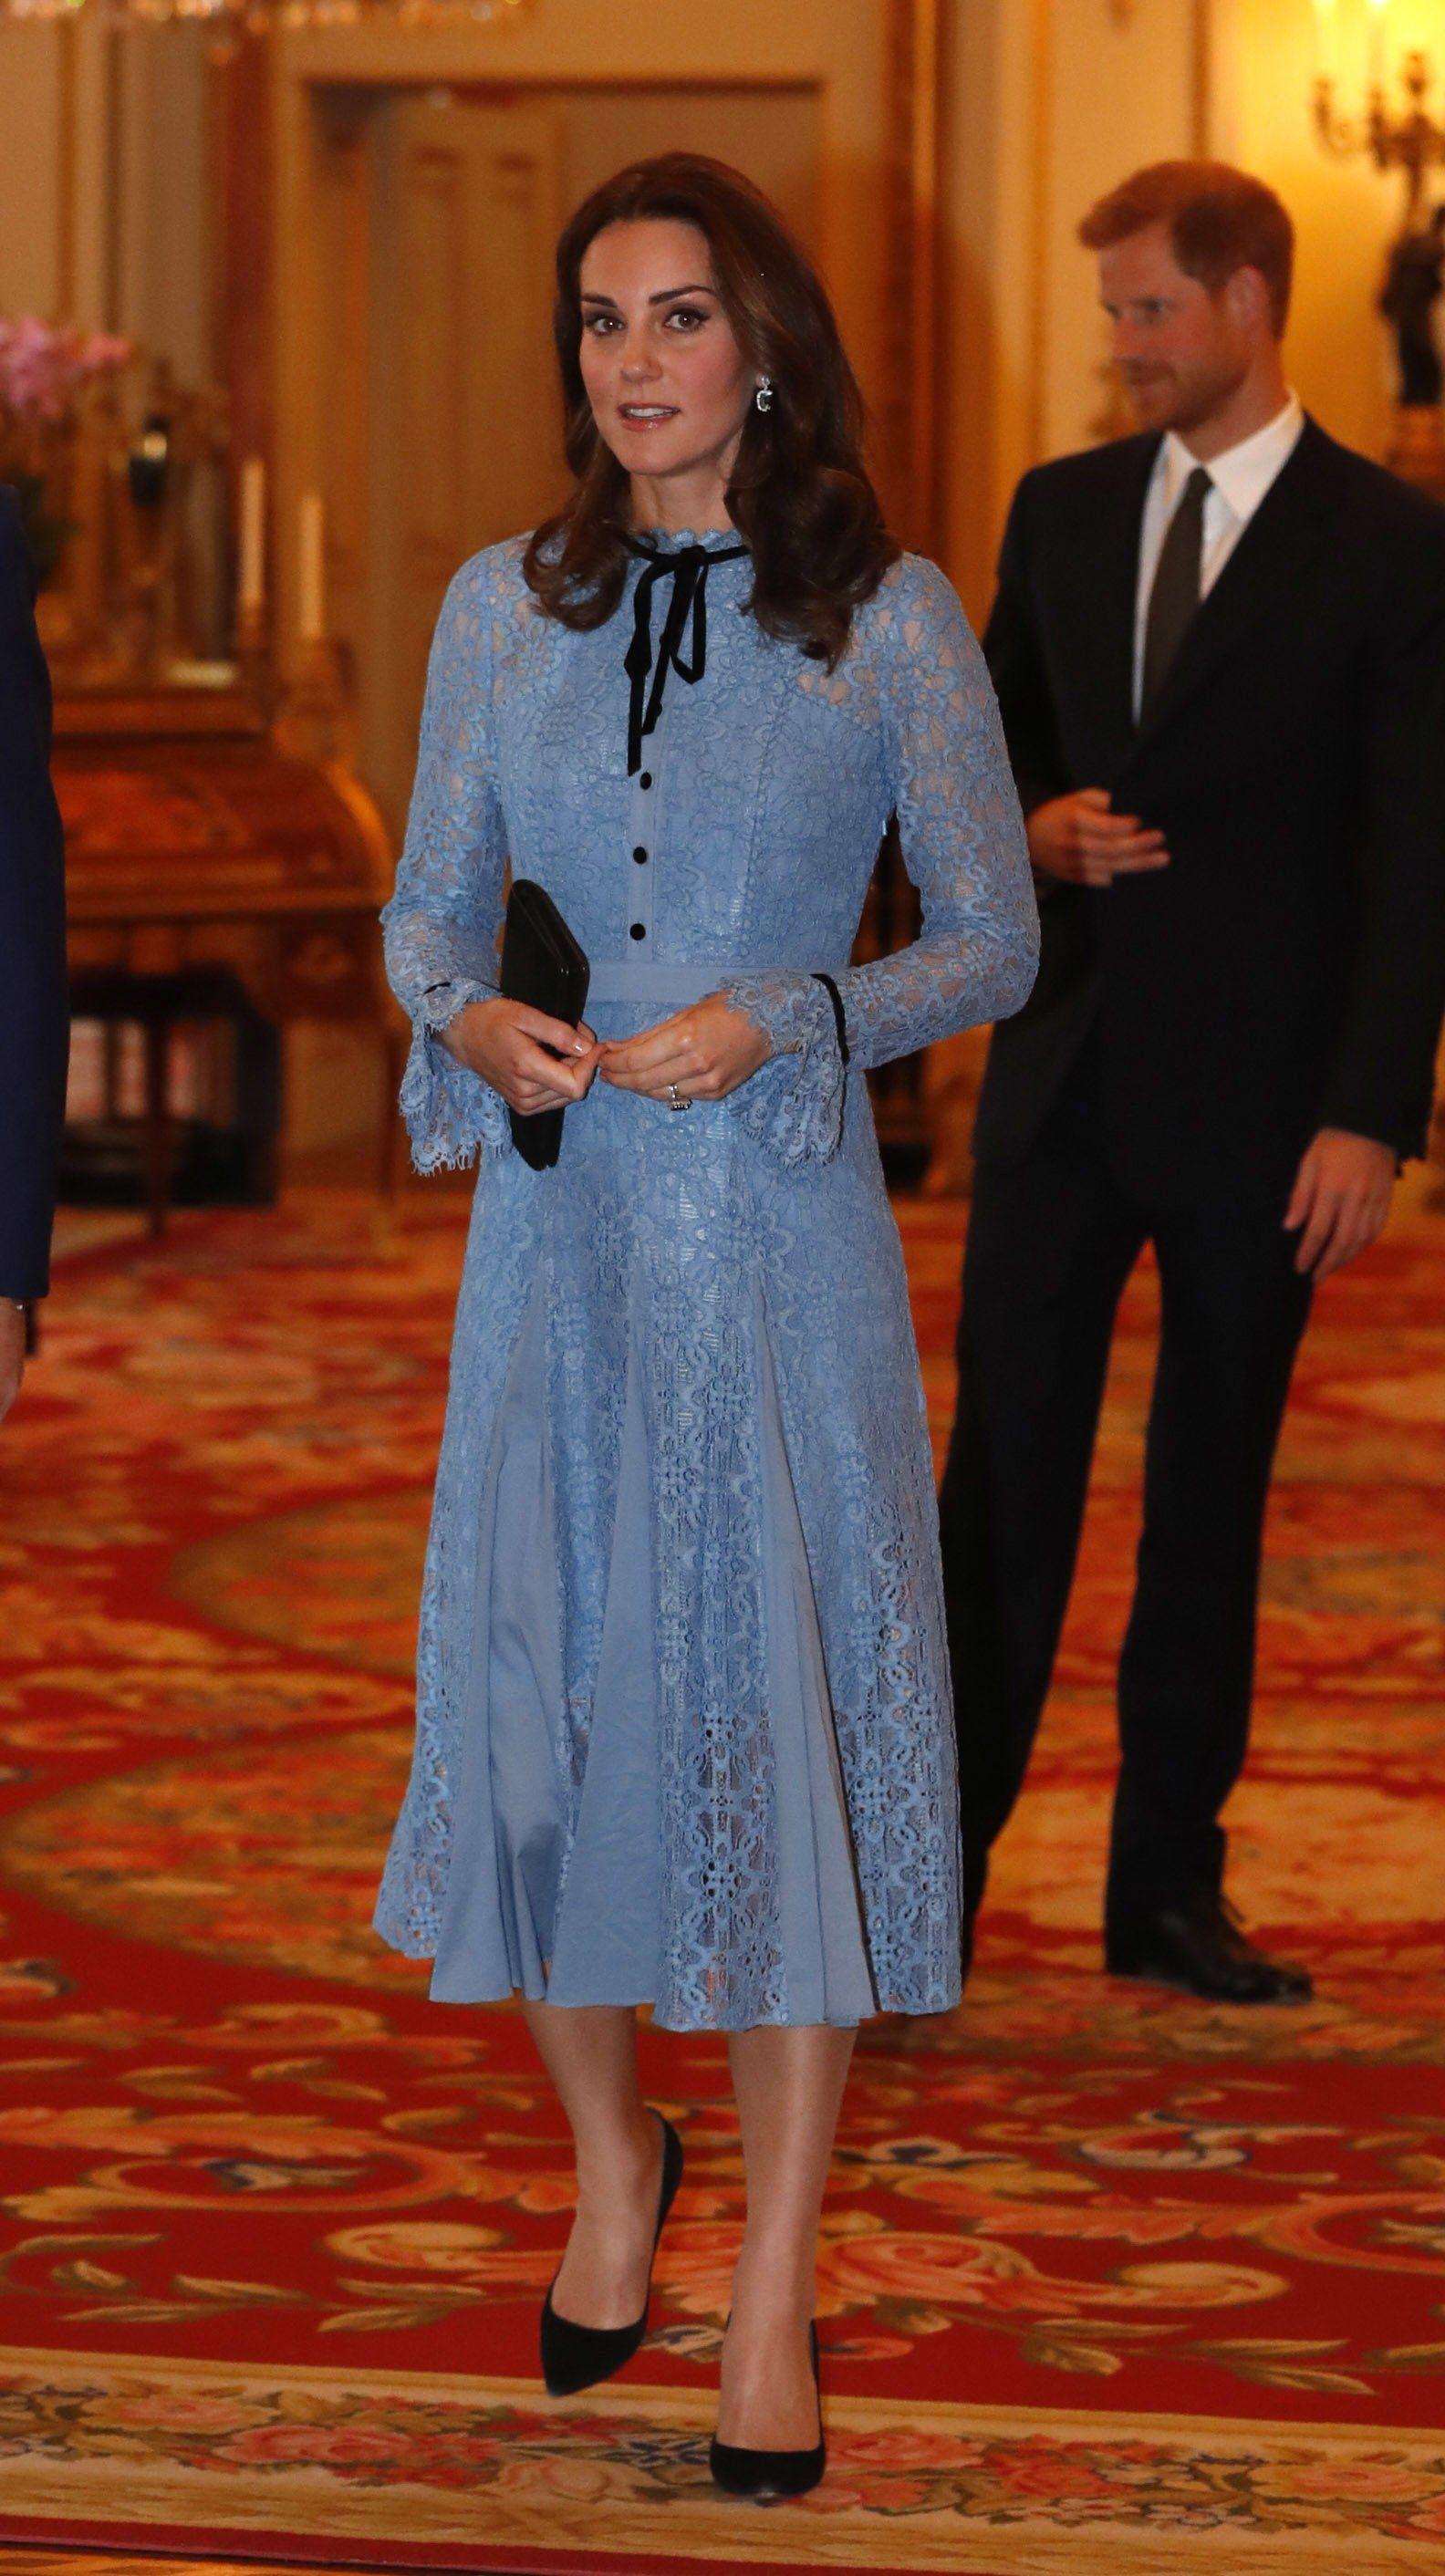 Melania Trump Wears Dolce & Gabbana to Donate Her Inaugural Ball ...